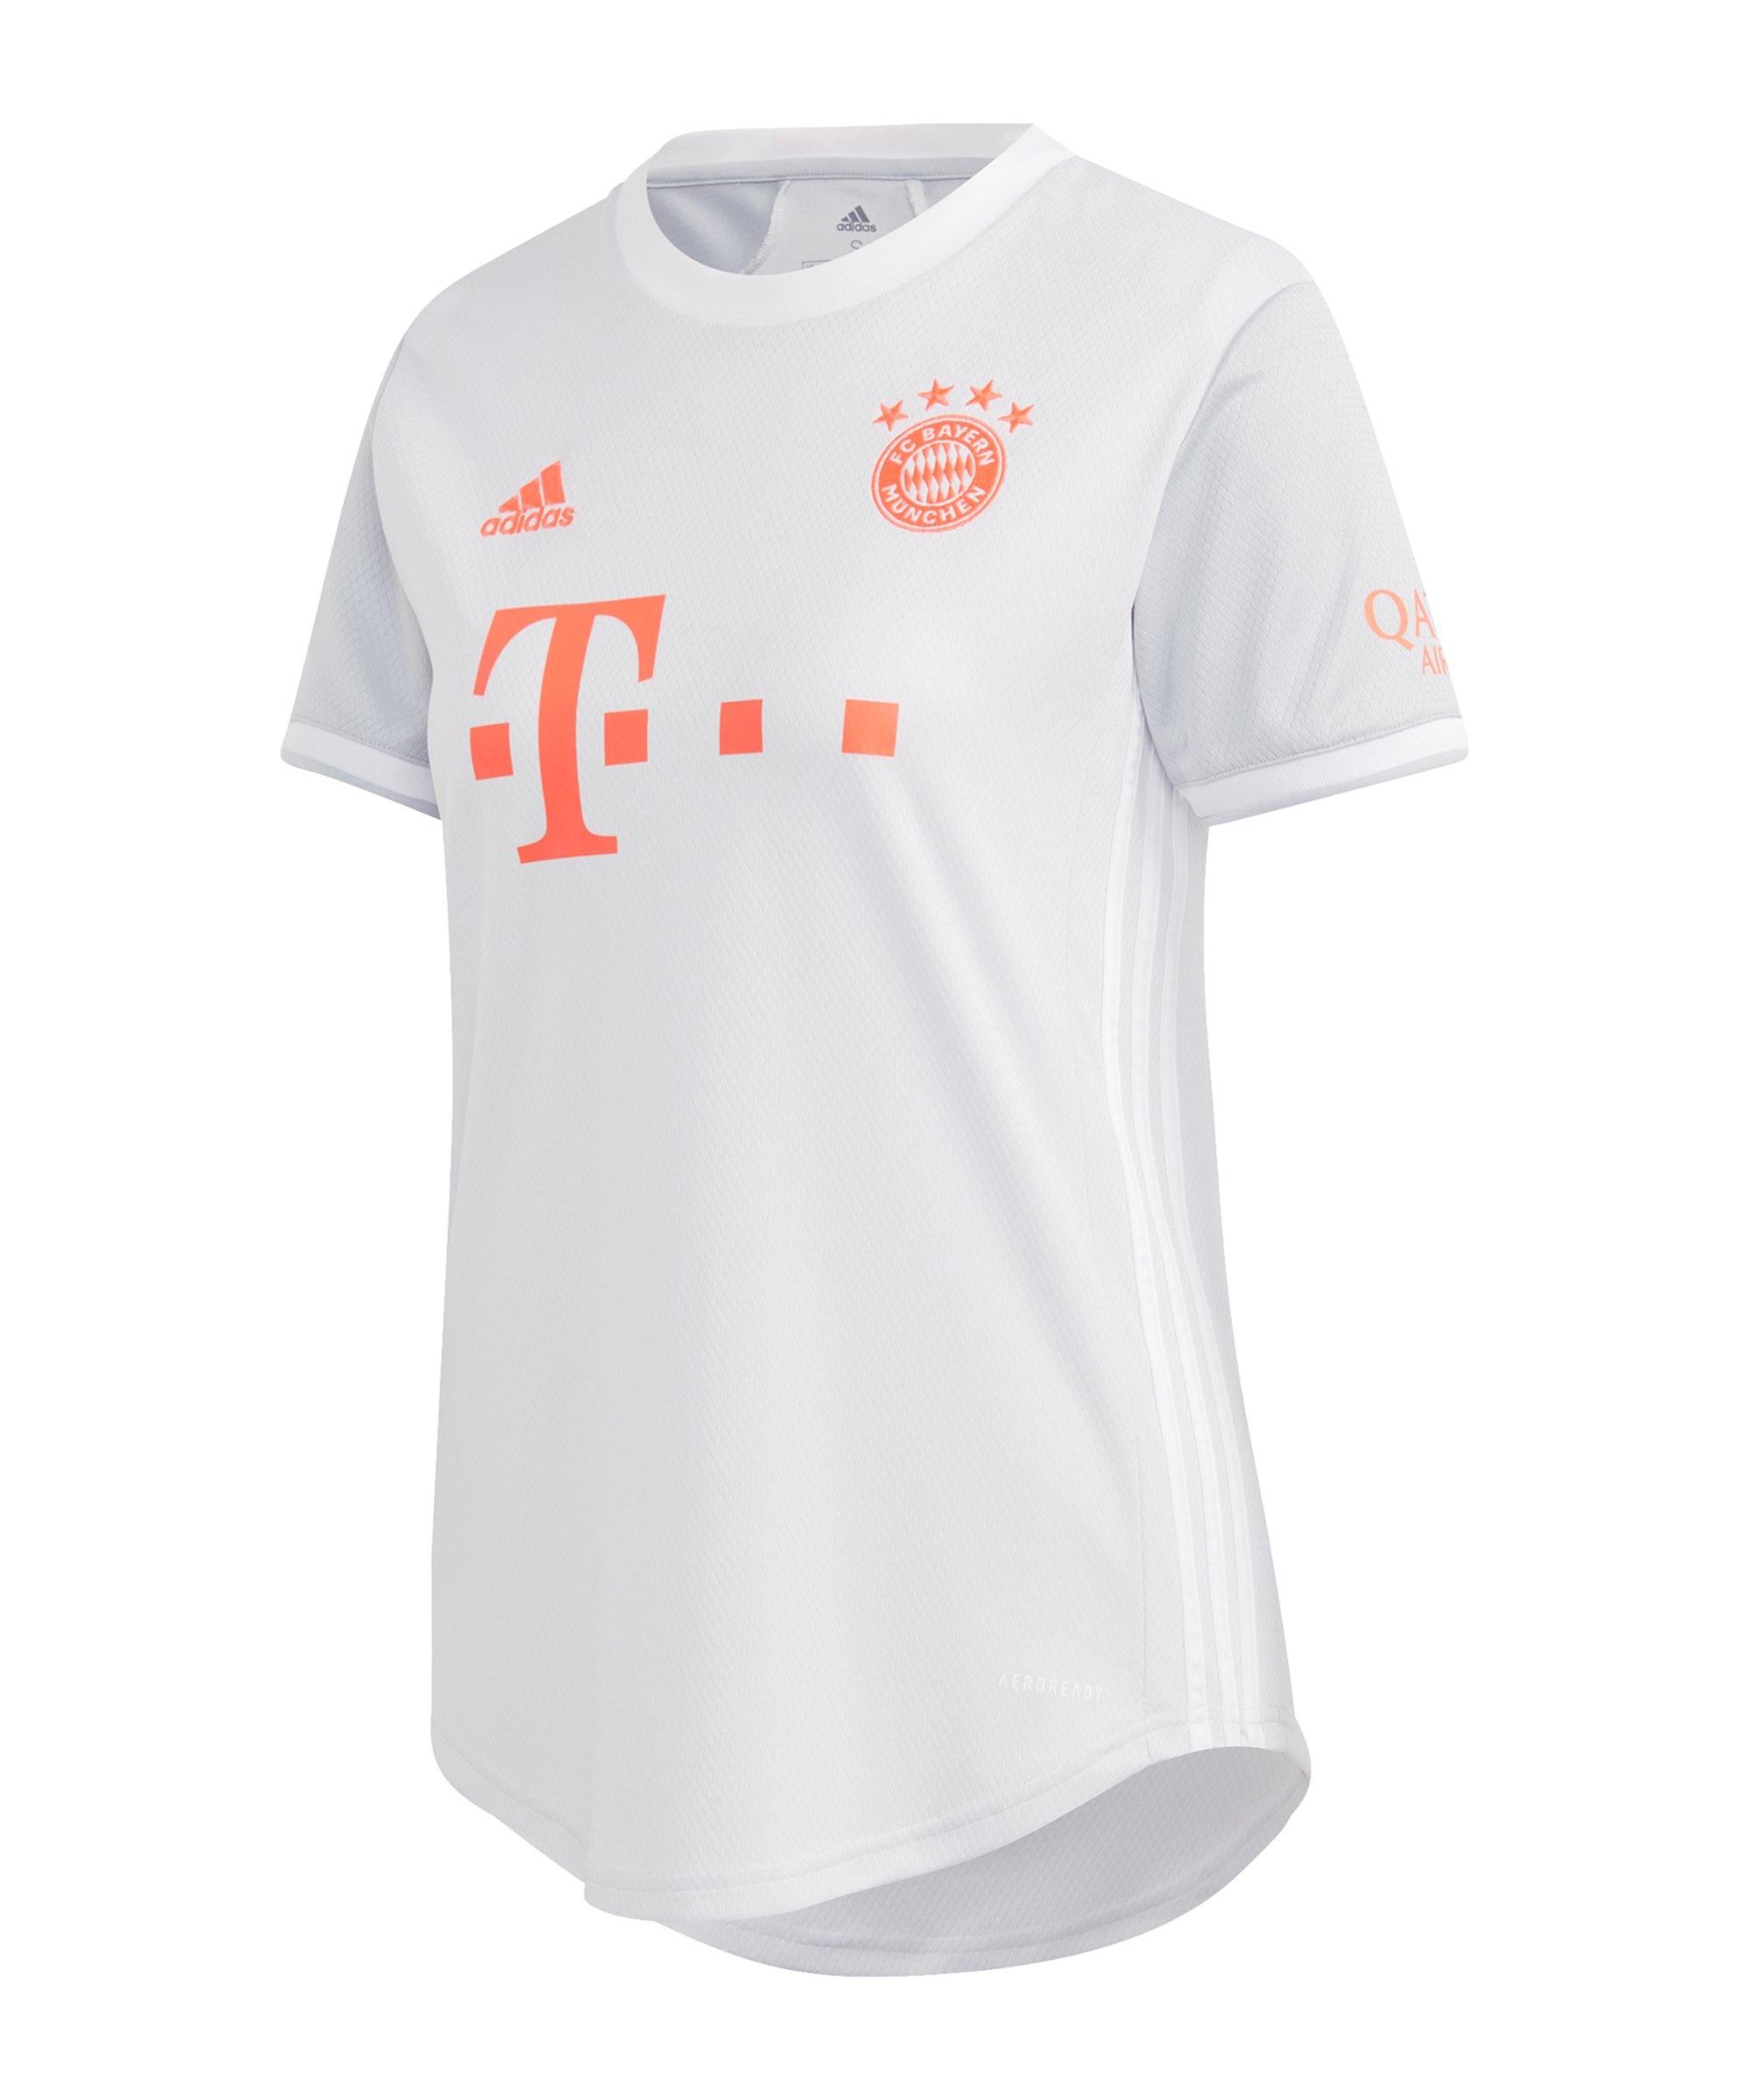 adidas FC Bayern München Trikot Away 2020/2021 Damen Weiss - grau